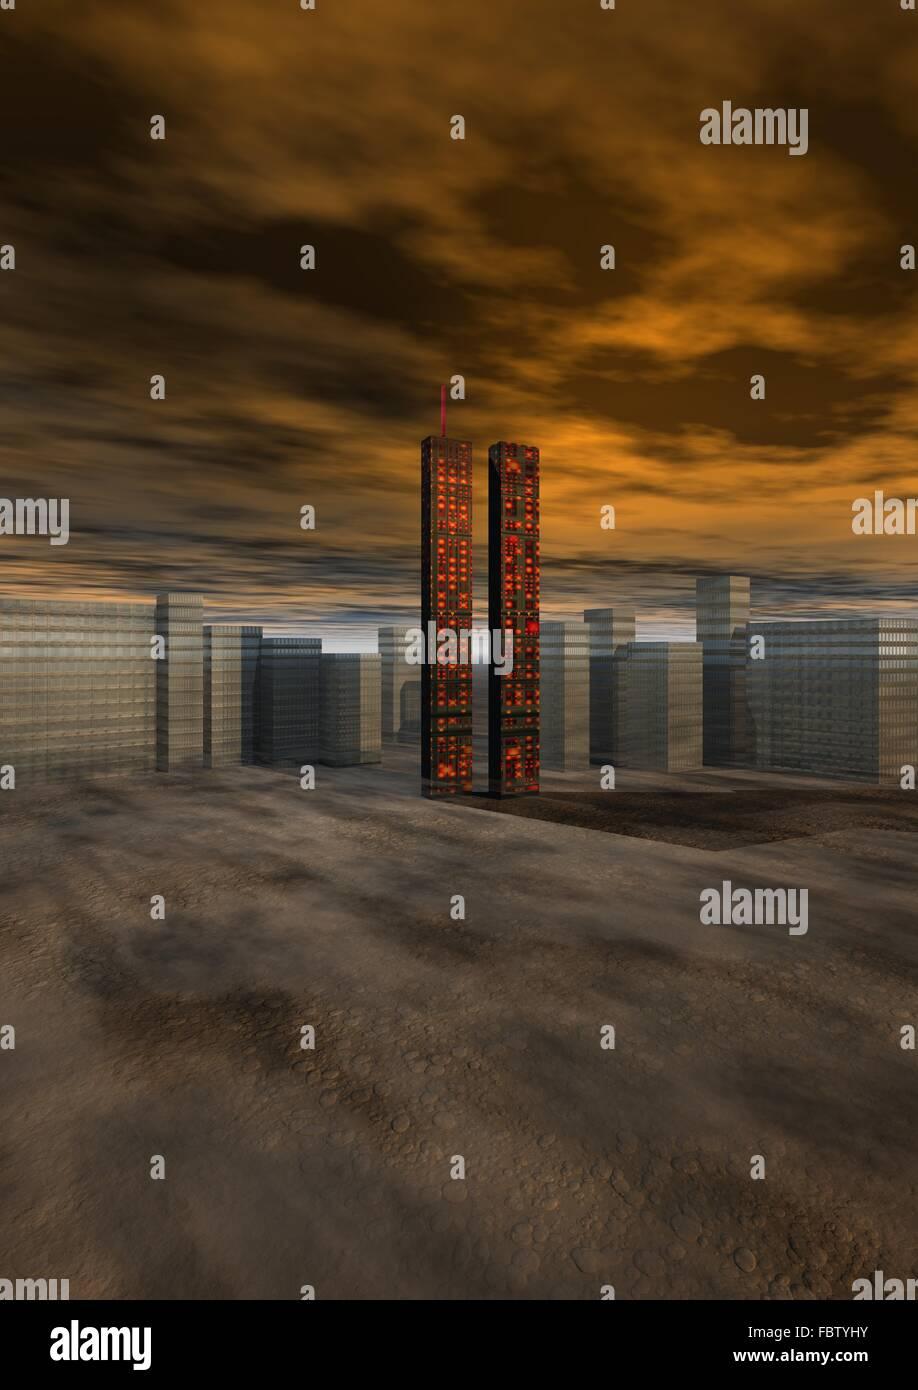 world trade center, new-york - Stock Image